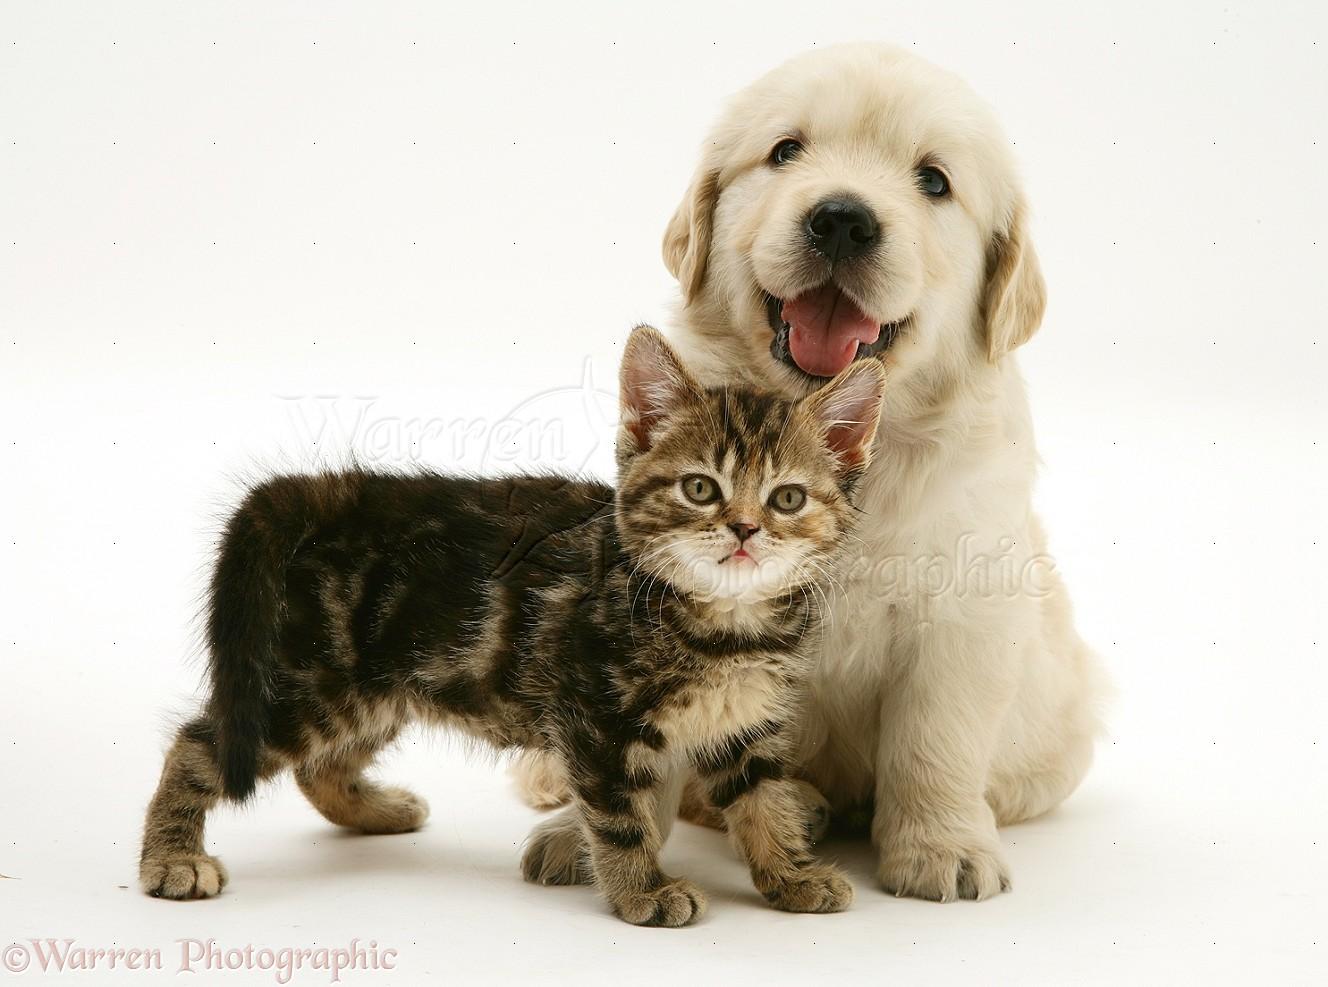 Pets: Tabby Kitten and Golden Retriever puppy photo WP24781